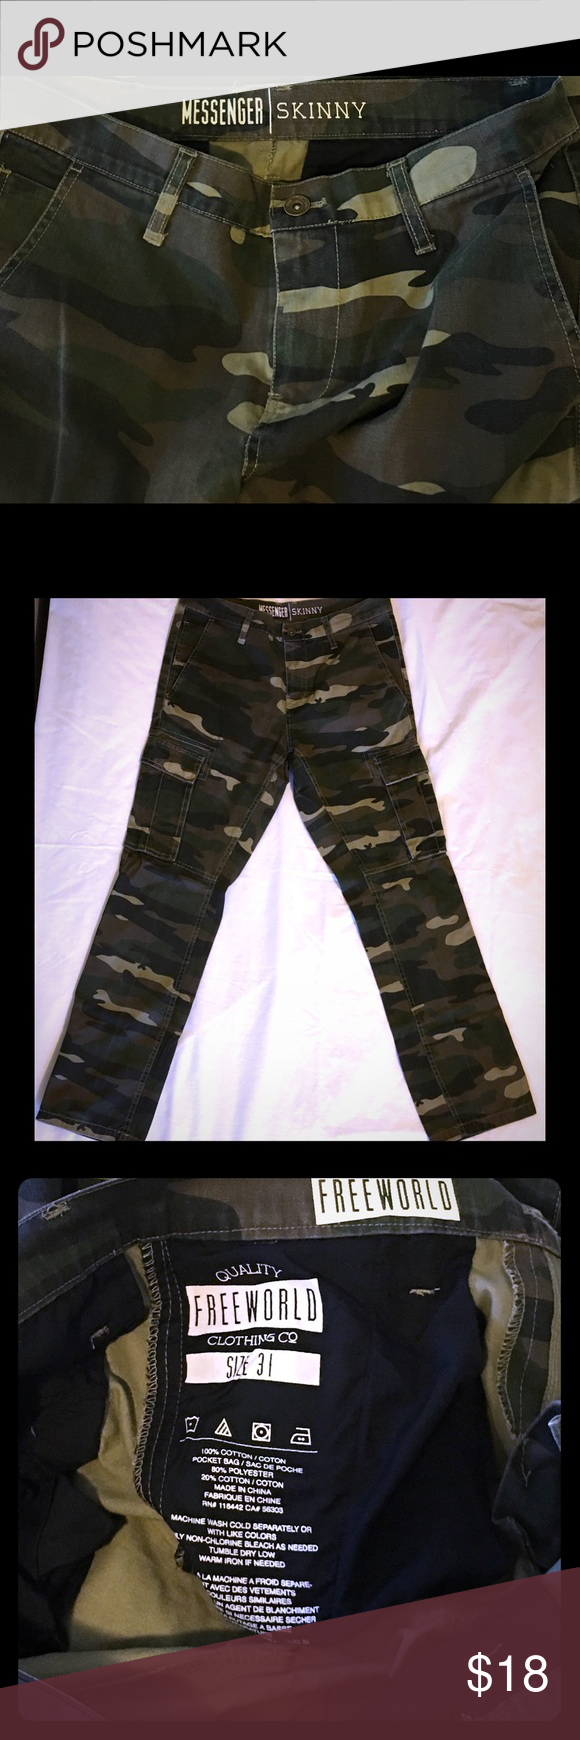 37b088e5 Freeworld Skinny Camo Cargo Pants 31x32 Freeworld Skinny Camo Cargo Pants  31x32 Waist: 31-